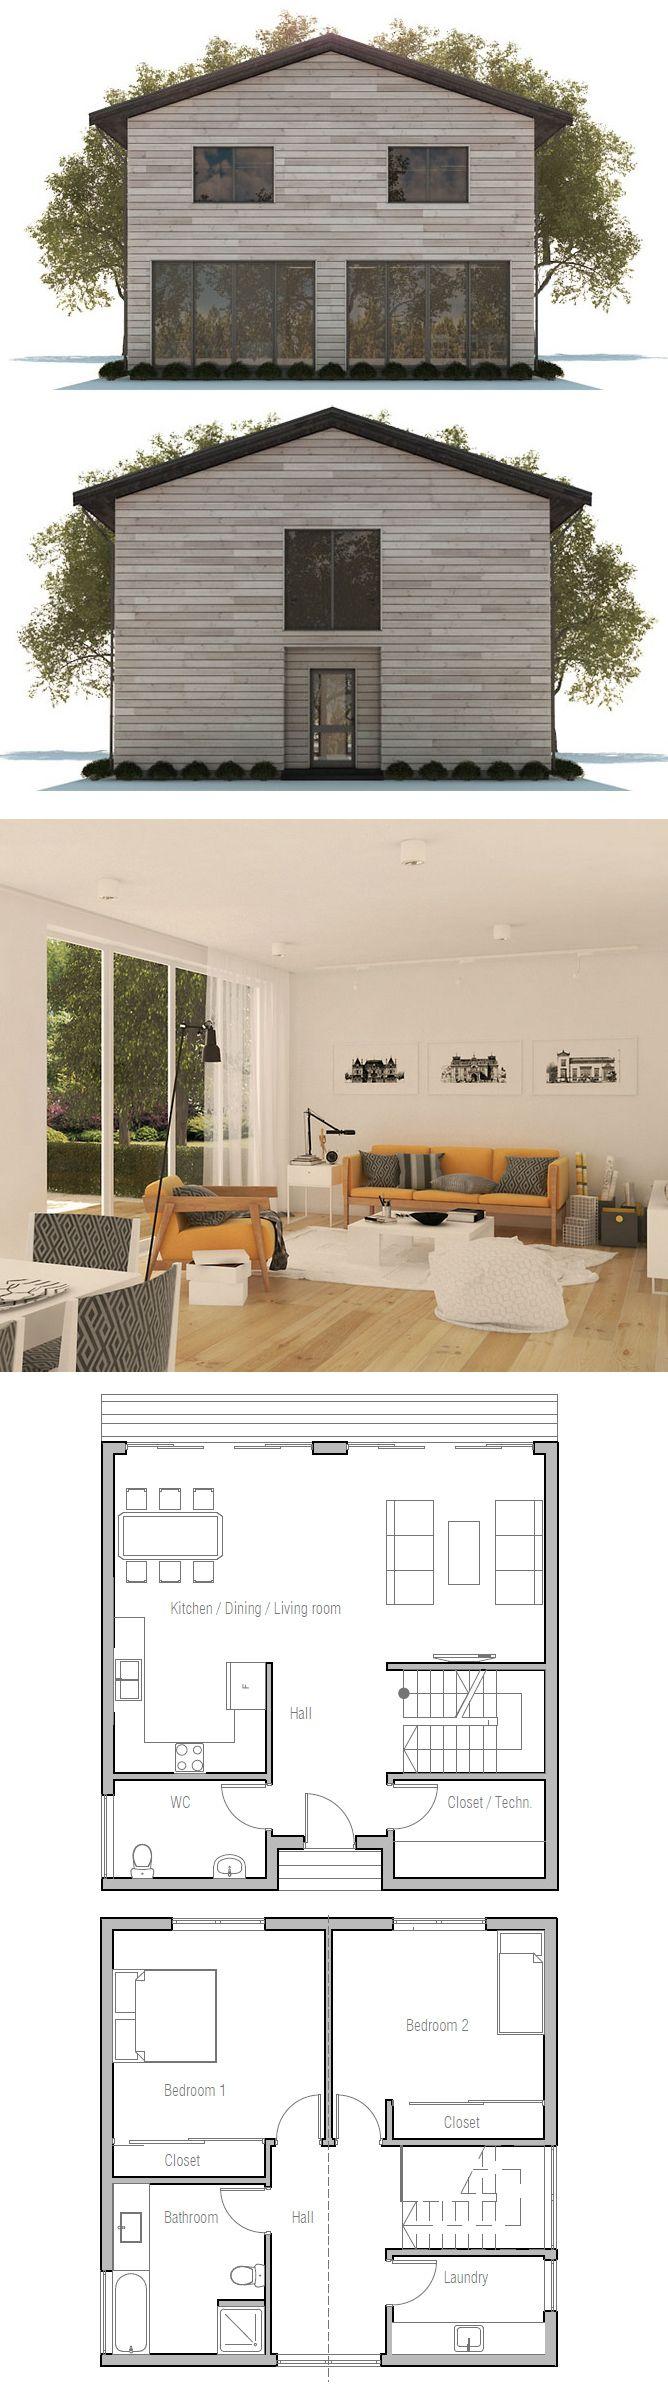 Narrow house plan narrow house plans pinterest house for Narrow house plans with attached garage